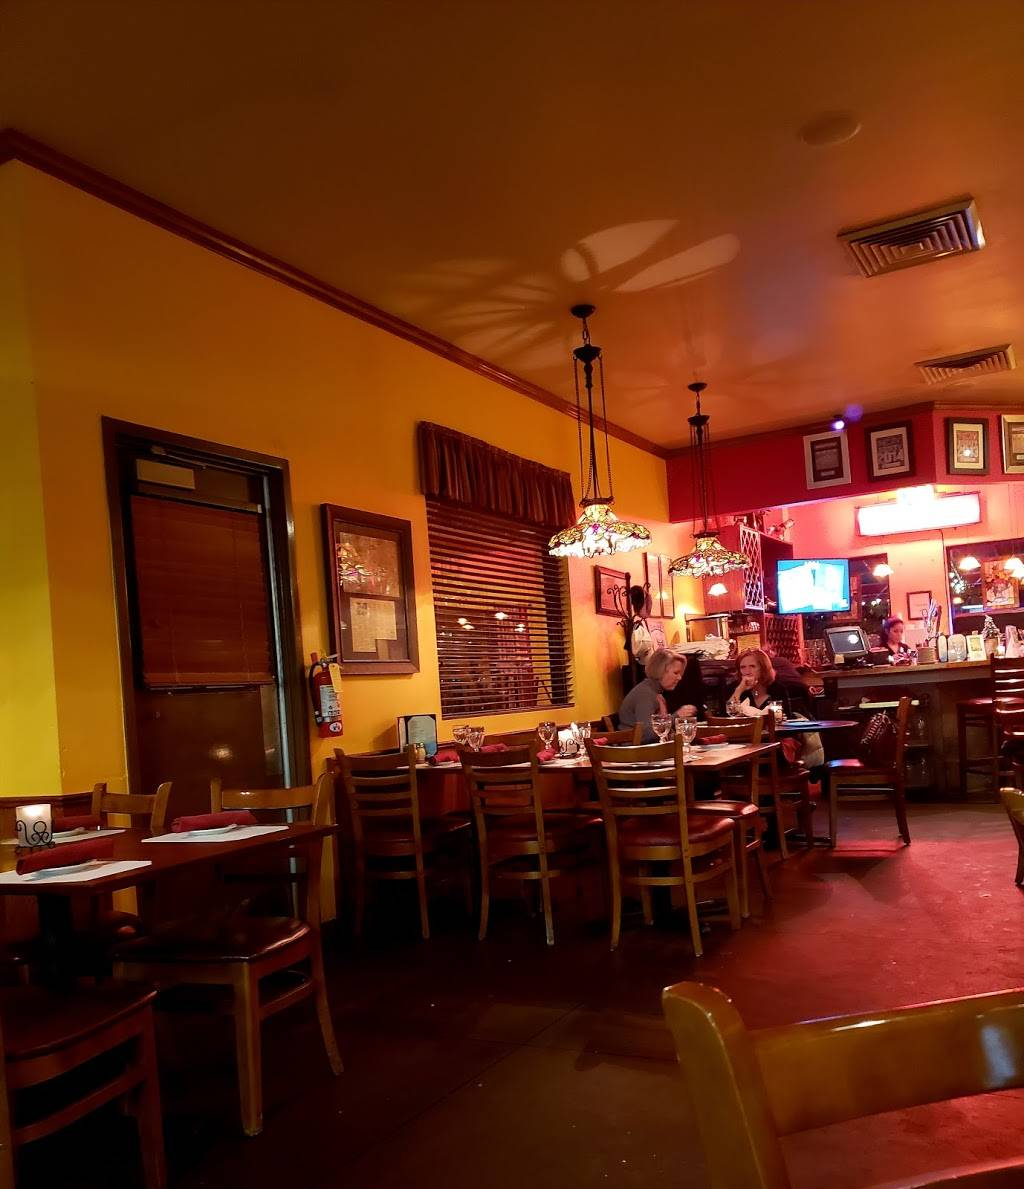 The Italian Kitchen West - restaurant  | Photo 3 of 10 | Address: 450 Thorn Ave, El Paso, TX 79912, USA | Phone: (915) 842-0775